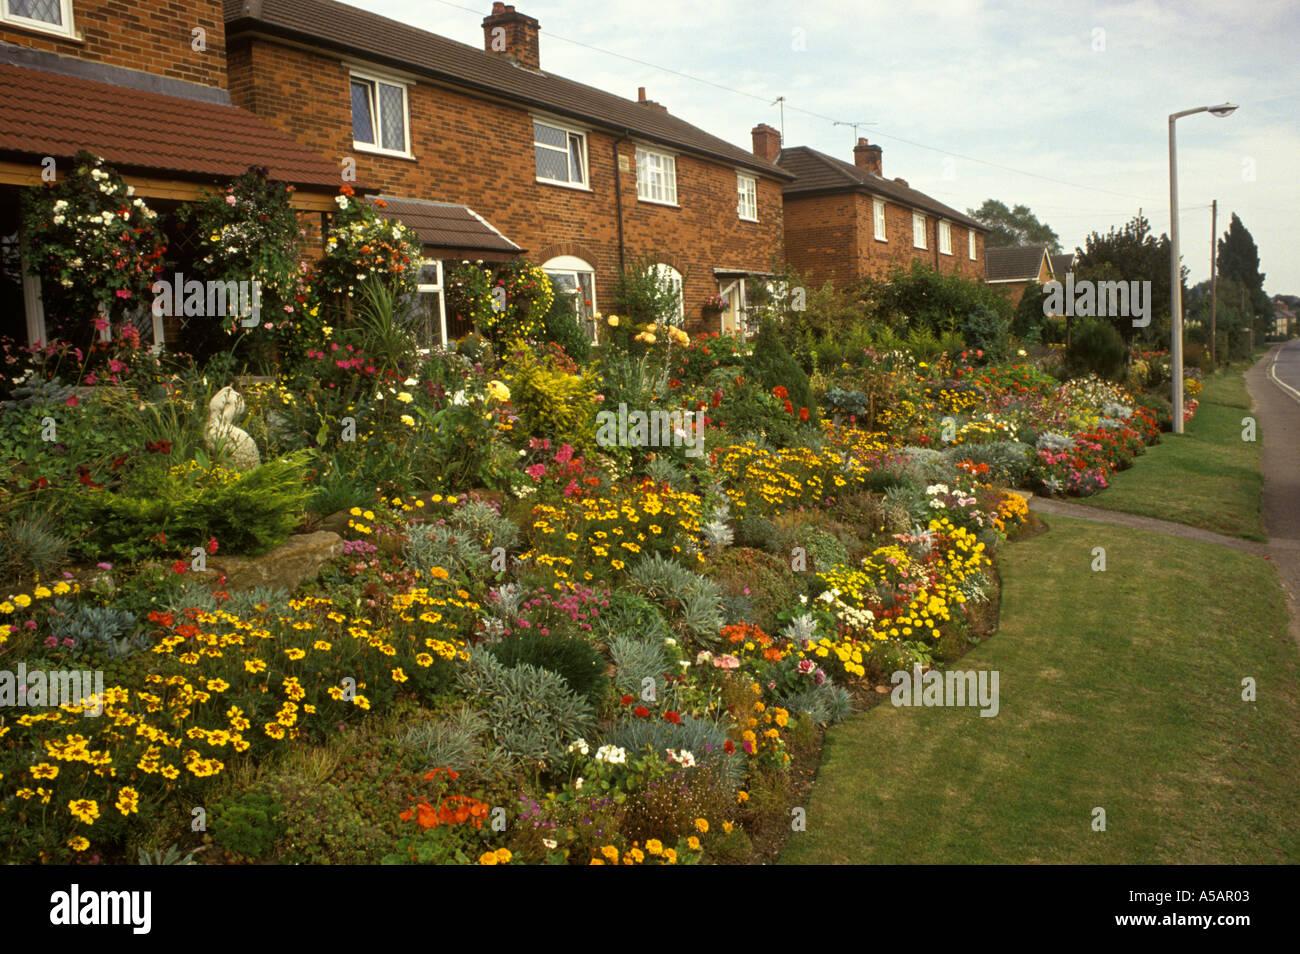 Bedford Gardens Stock Photos & Bedford Gardens Stock Images - Alamy